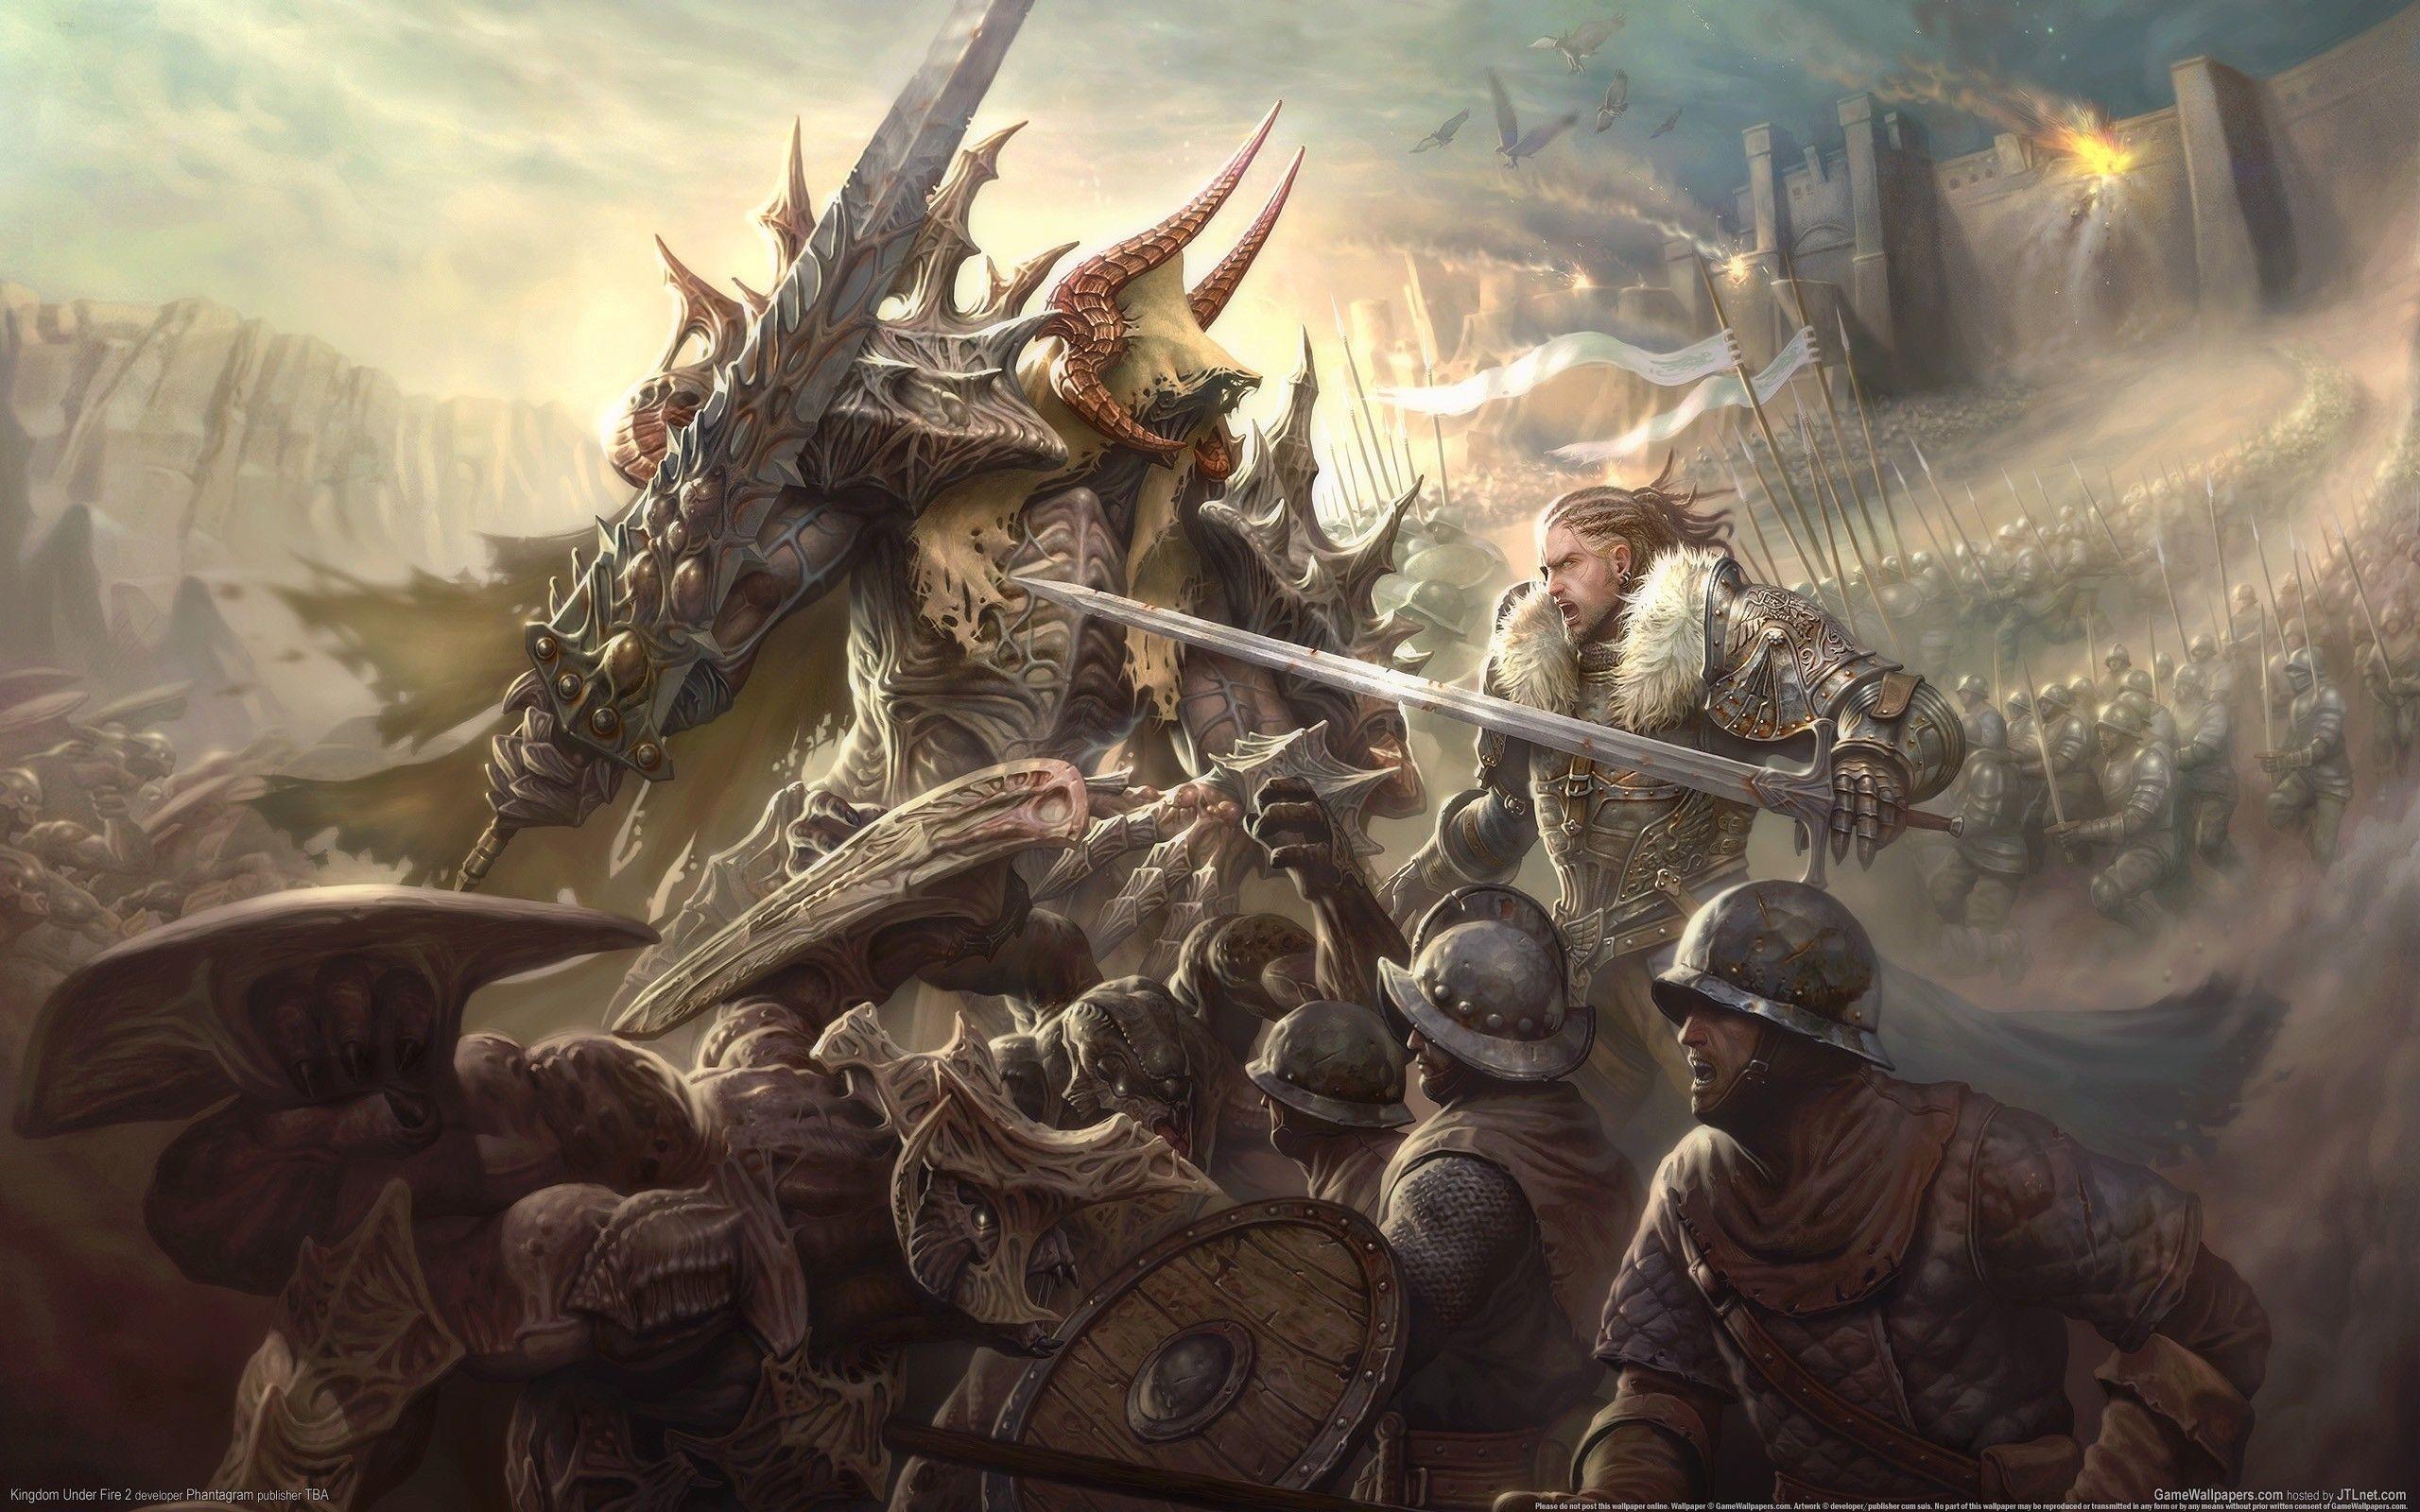 Video Games Kingdom Under Fire 3D : Desktop and mobile wallpaper .